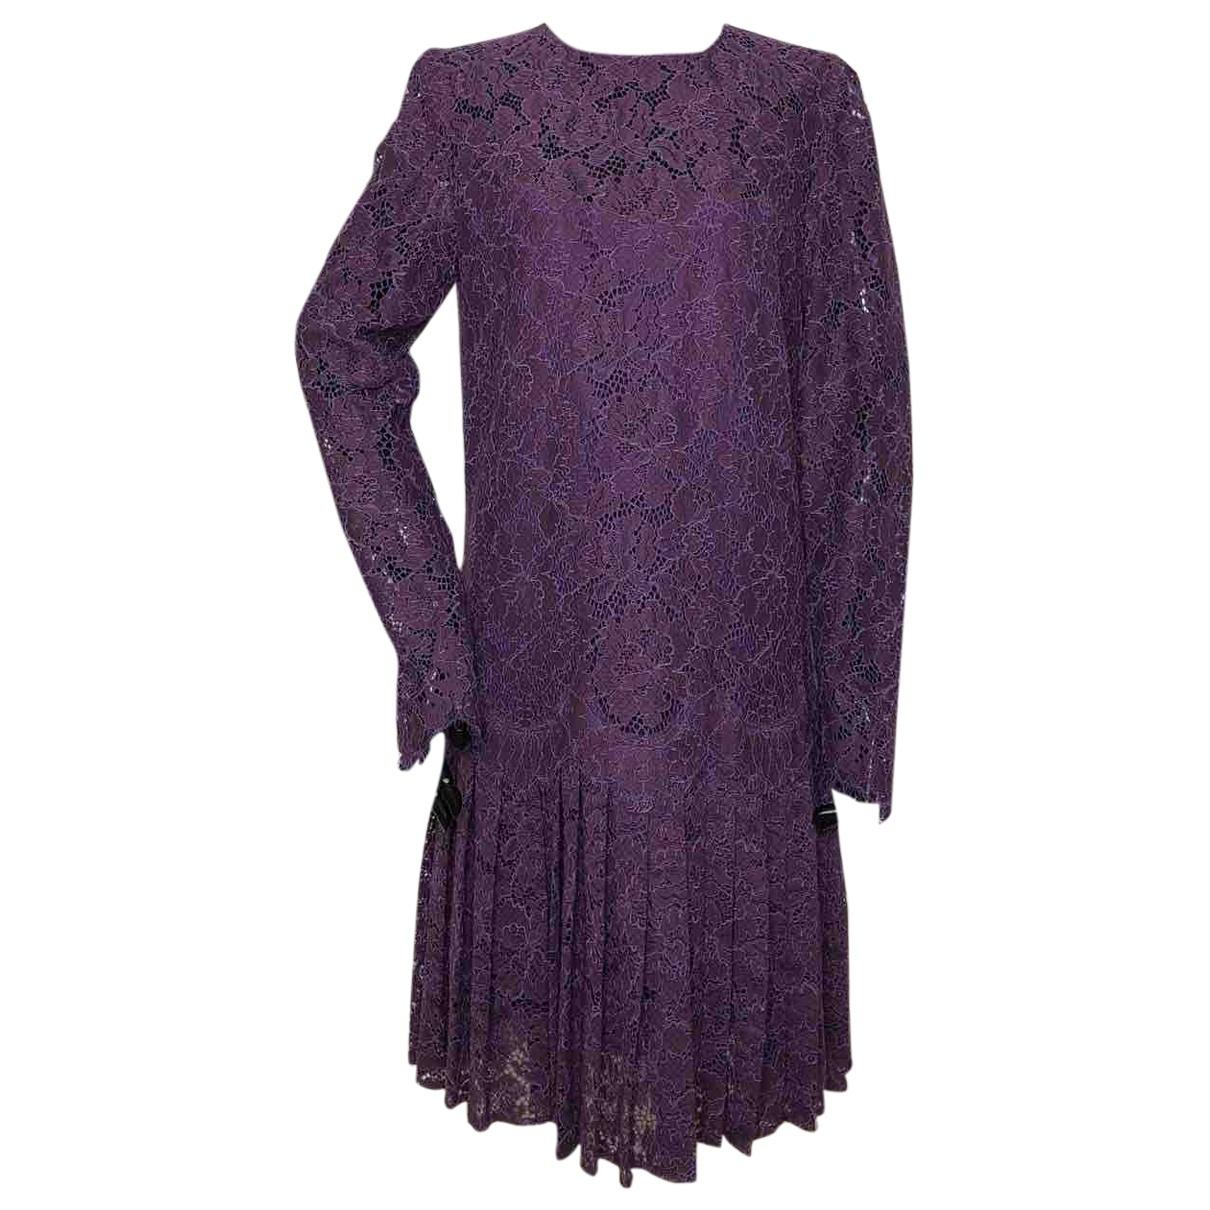 Ermanno Scervino \N Purple dress for Women 42 IT